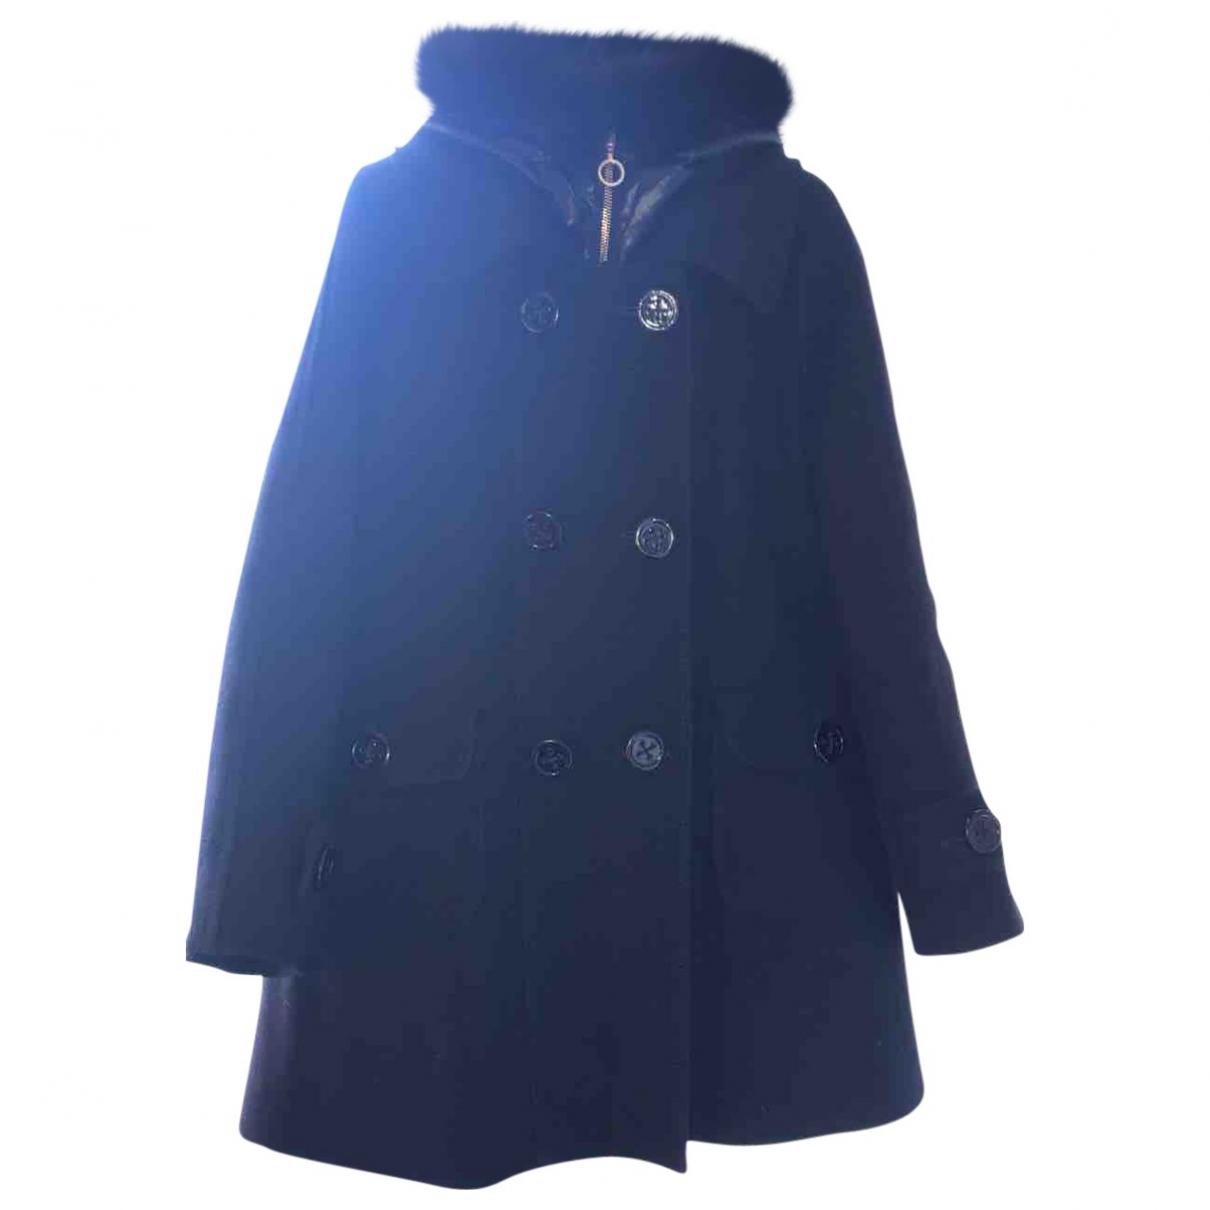 Moncler \N Black Wool coat for Women 0 0-5